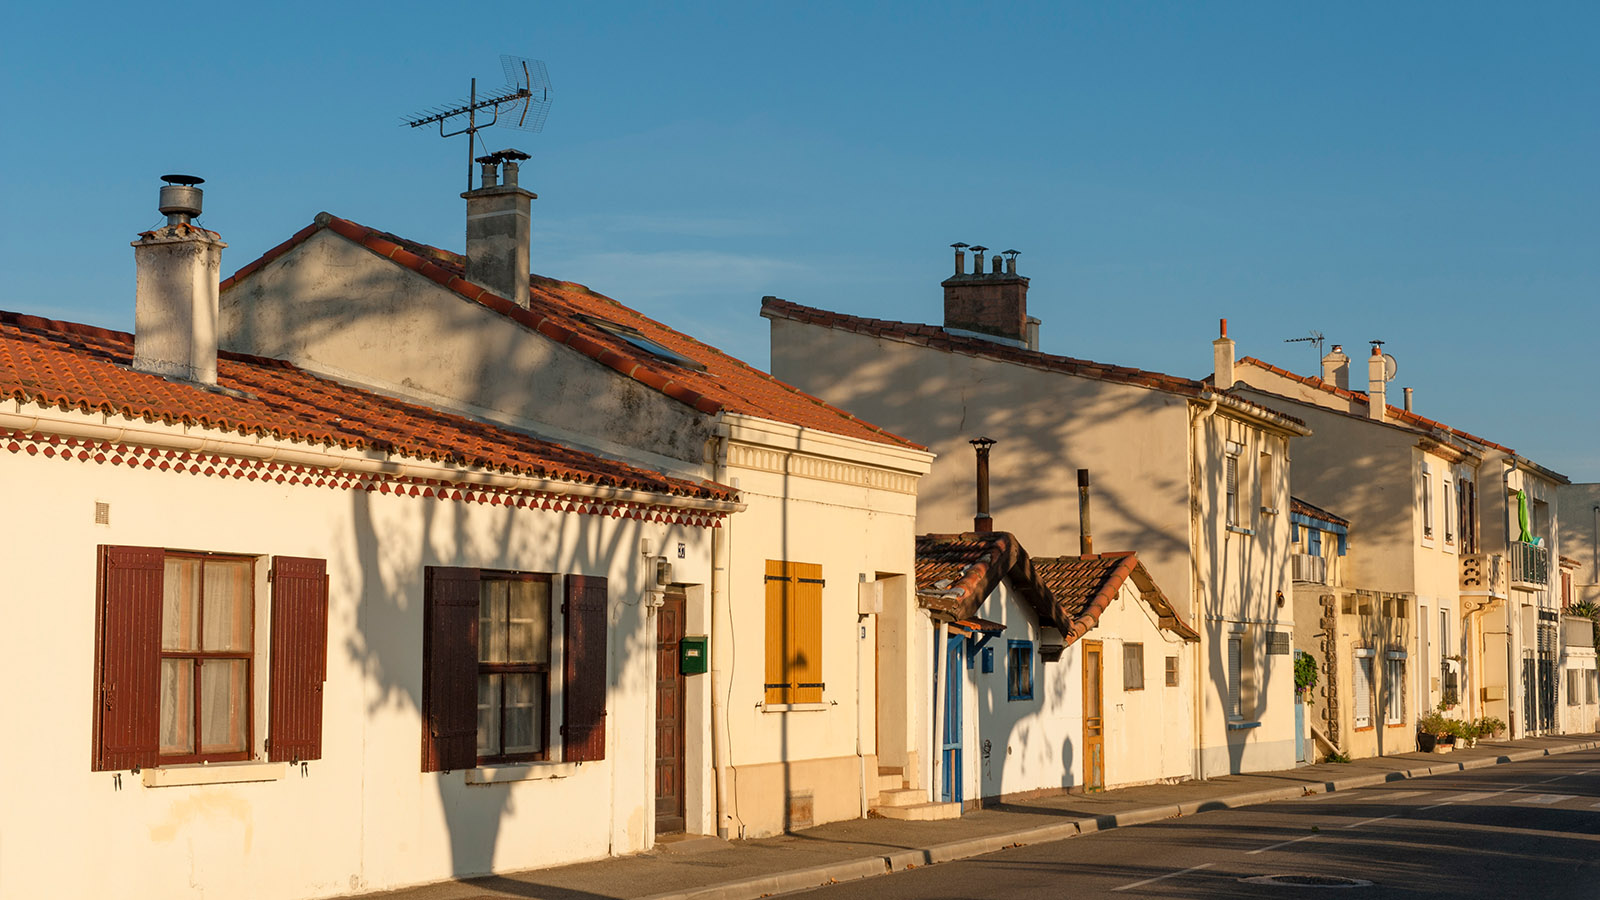 Häuserreihe in Port Saint-Louis-du-Rhône. Foto: Hilke Maunder